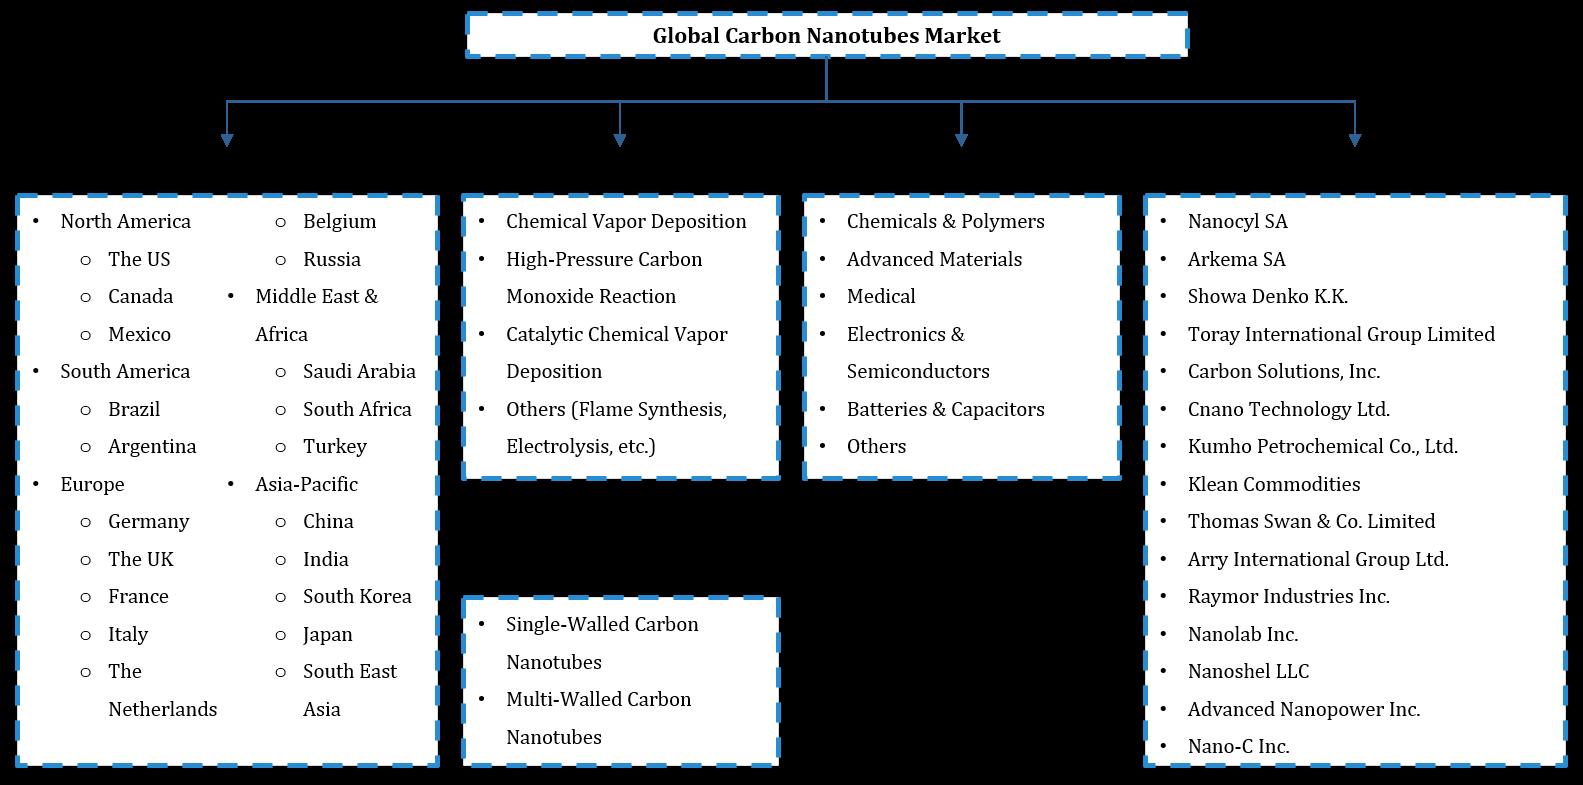 Global Carbon Nanotubes Market Segmentation